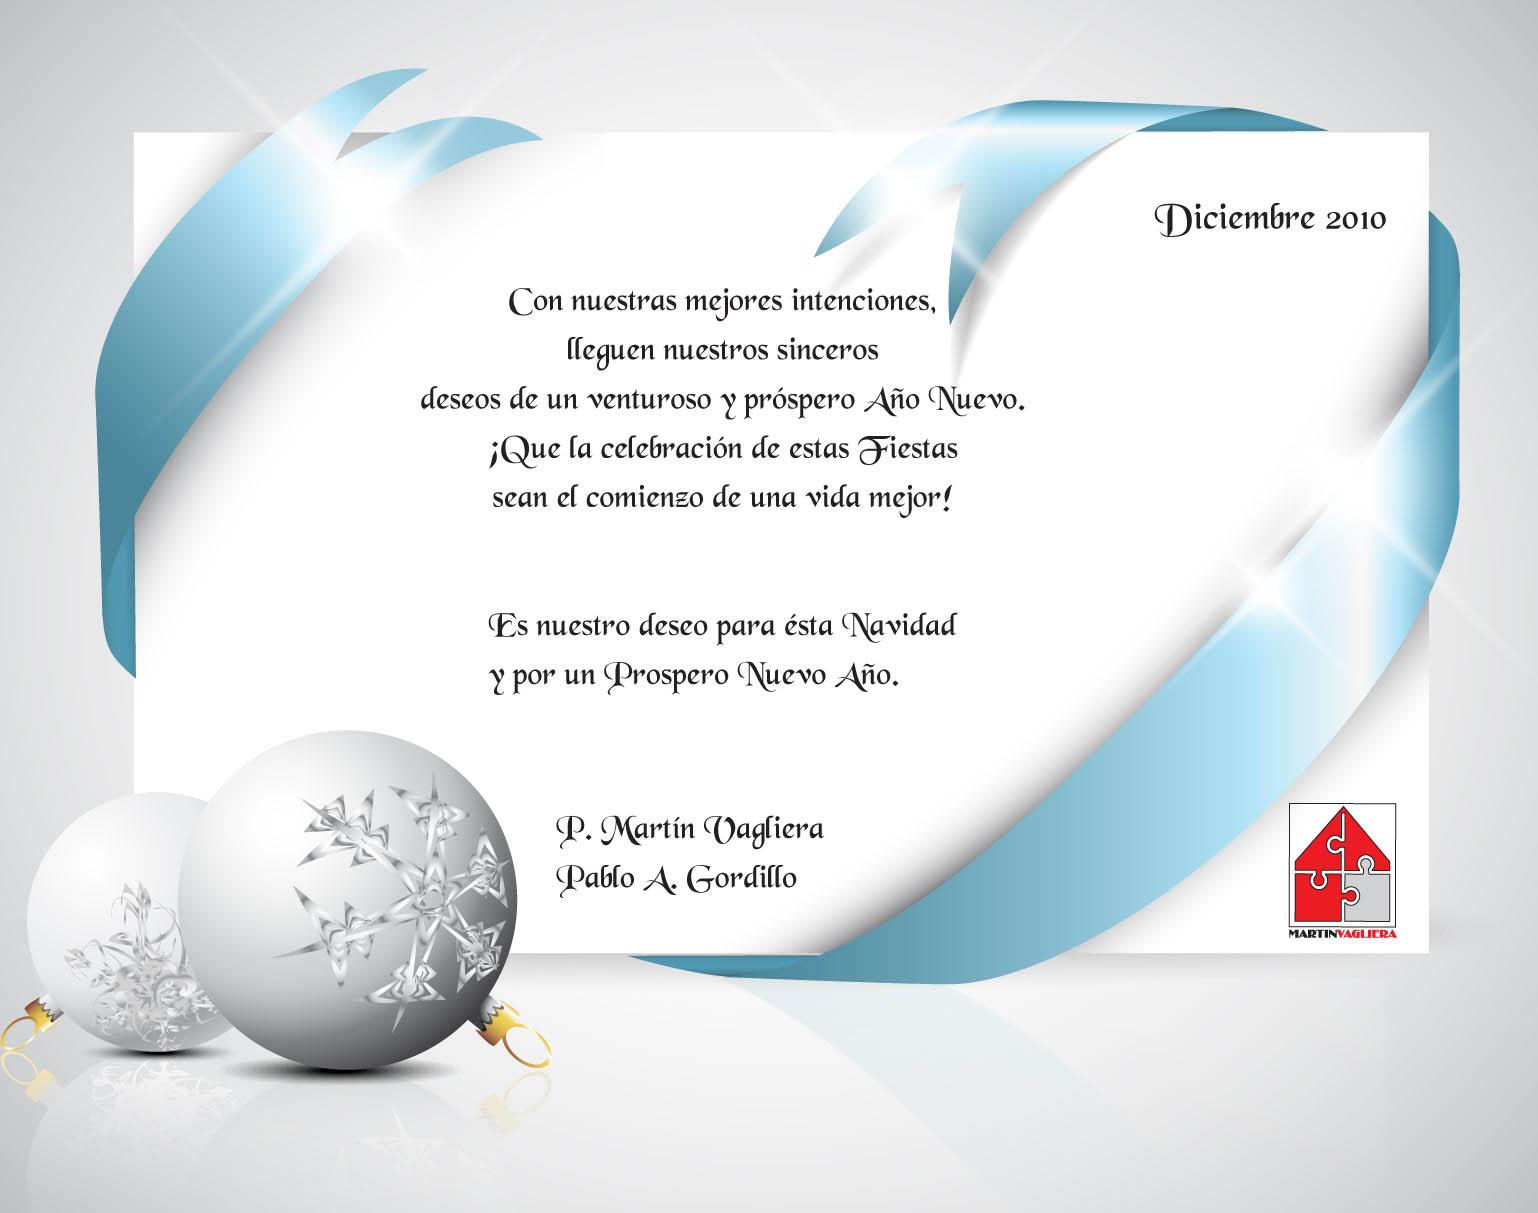 febccfe16f637 Mona lisa tarjetas navideñas empresariales jpg 1538x1213 Tarjeta de  invitacion empresariales